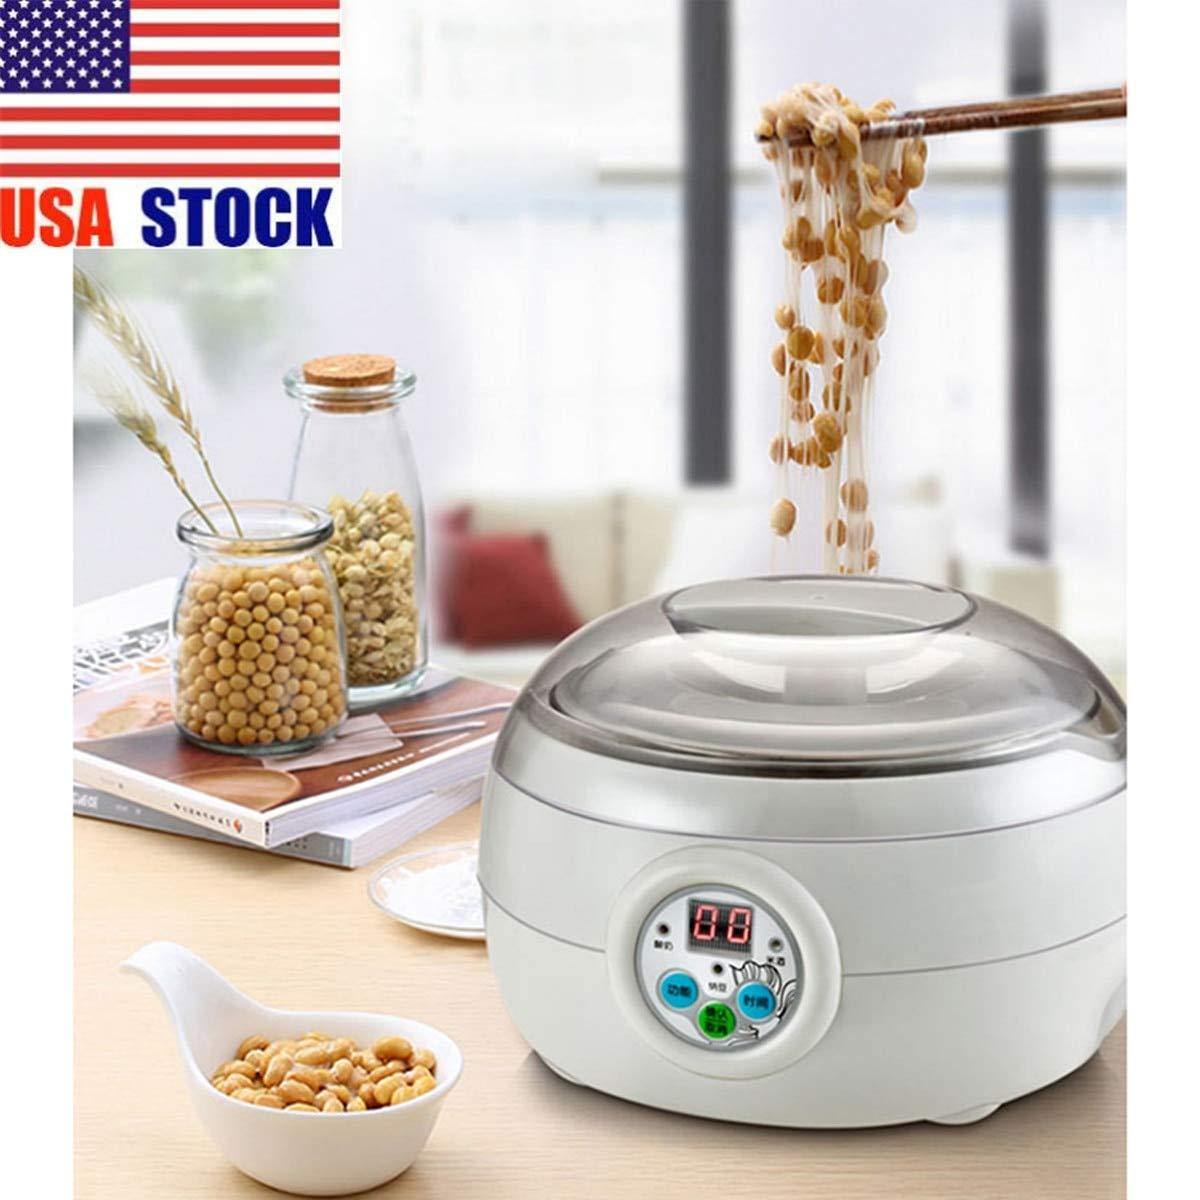 1.5L 220V 15W White Electric Automatic Yoghurt Maker Rice Wine Cuisine Container Yogurt Maker Kitchen Appliance 14x21cm